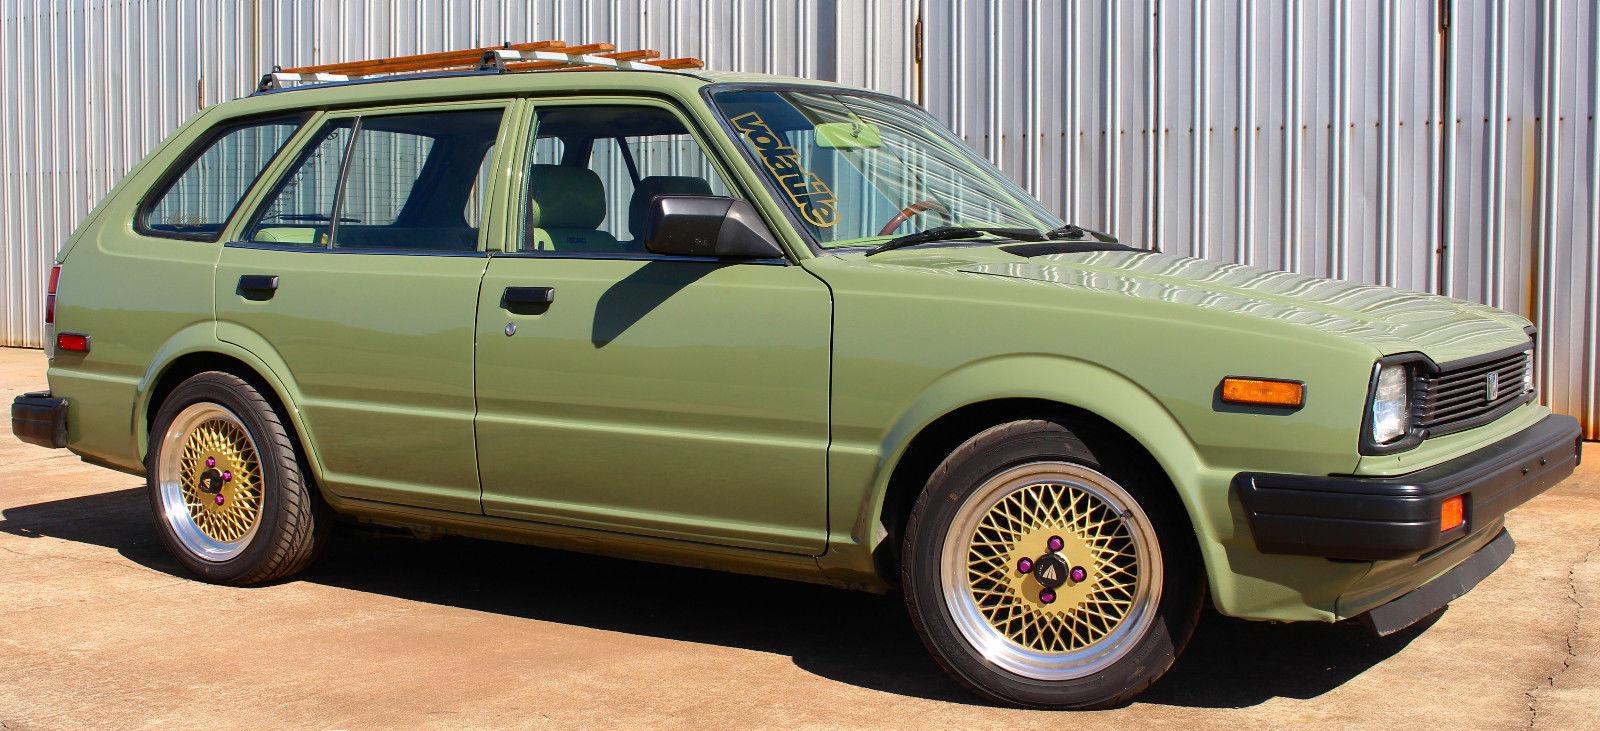 Kelebihan Honda Civic 1983 Murah Berkualitas